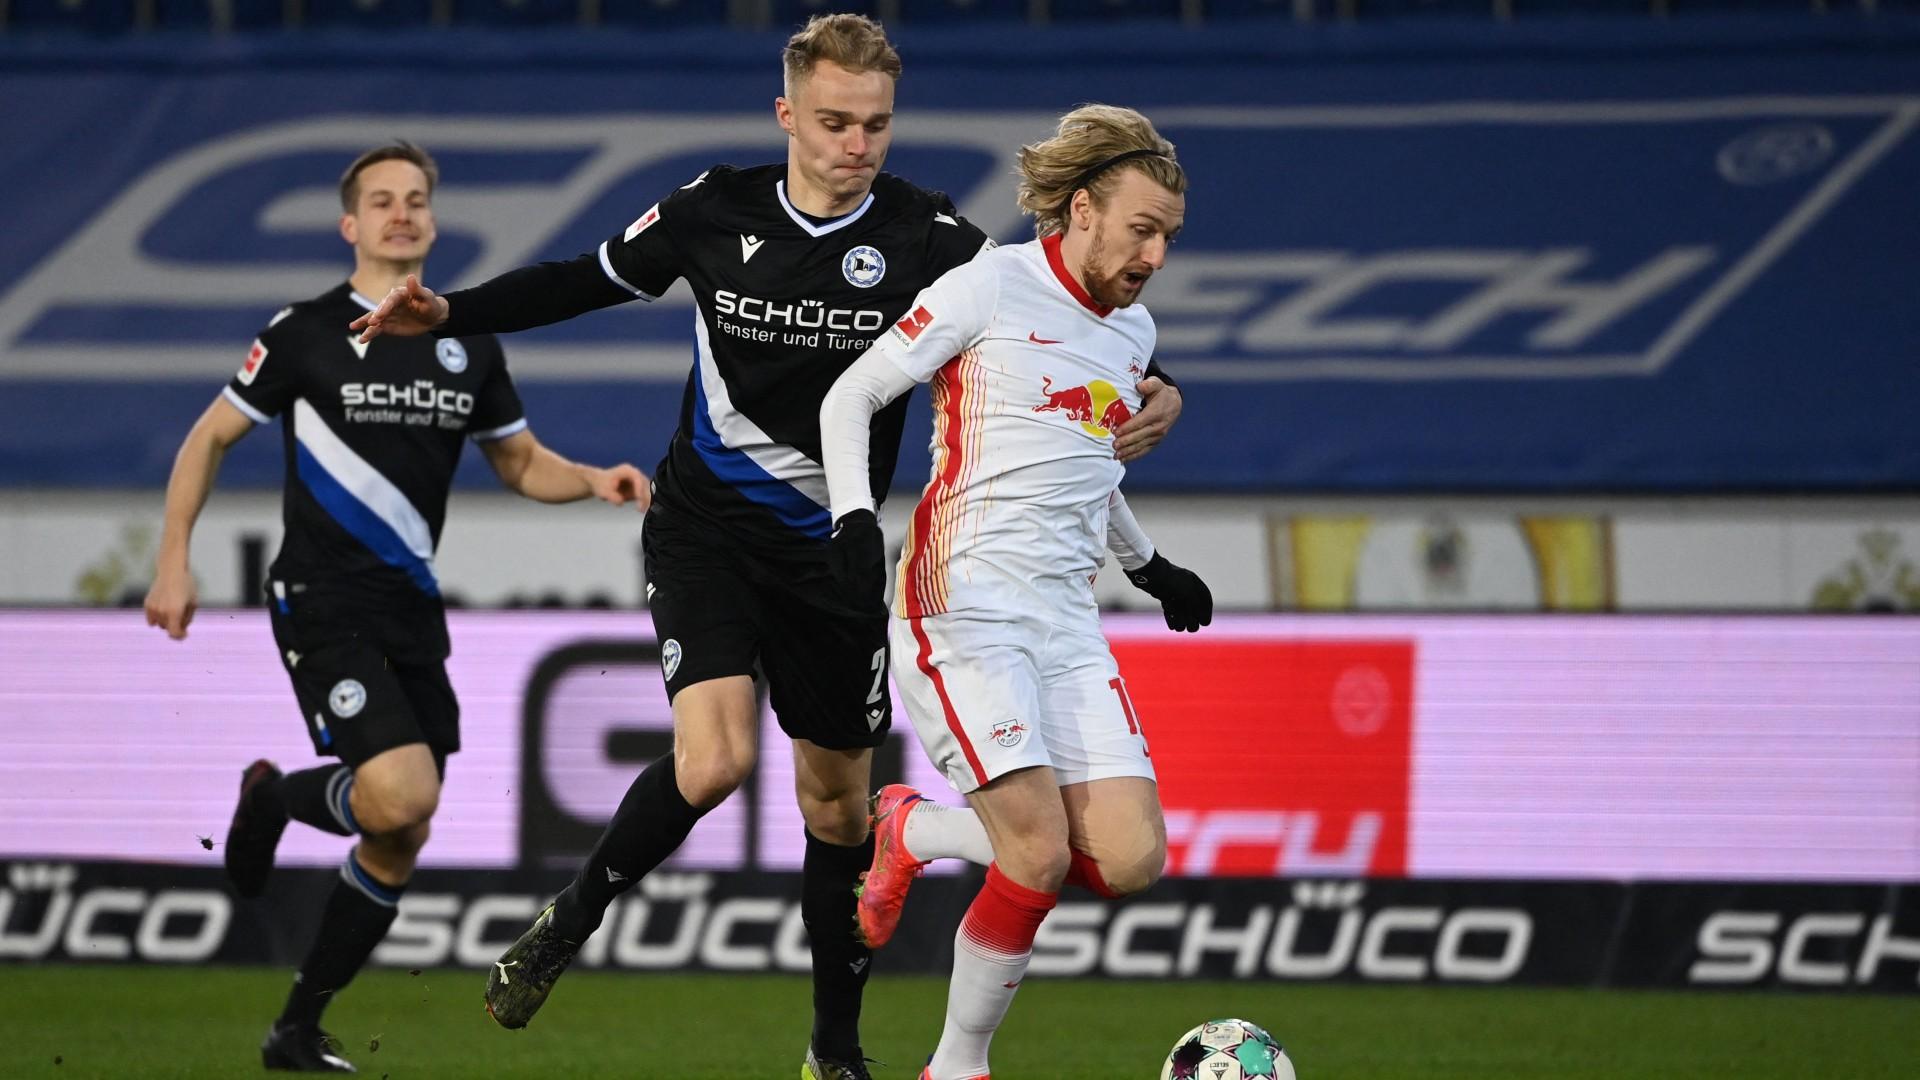 Arminia Bielefeld vs. RB Leipzig Spielbericht, 19.03.21, Bundesliga    Goal.com